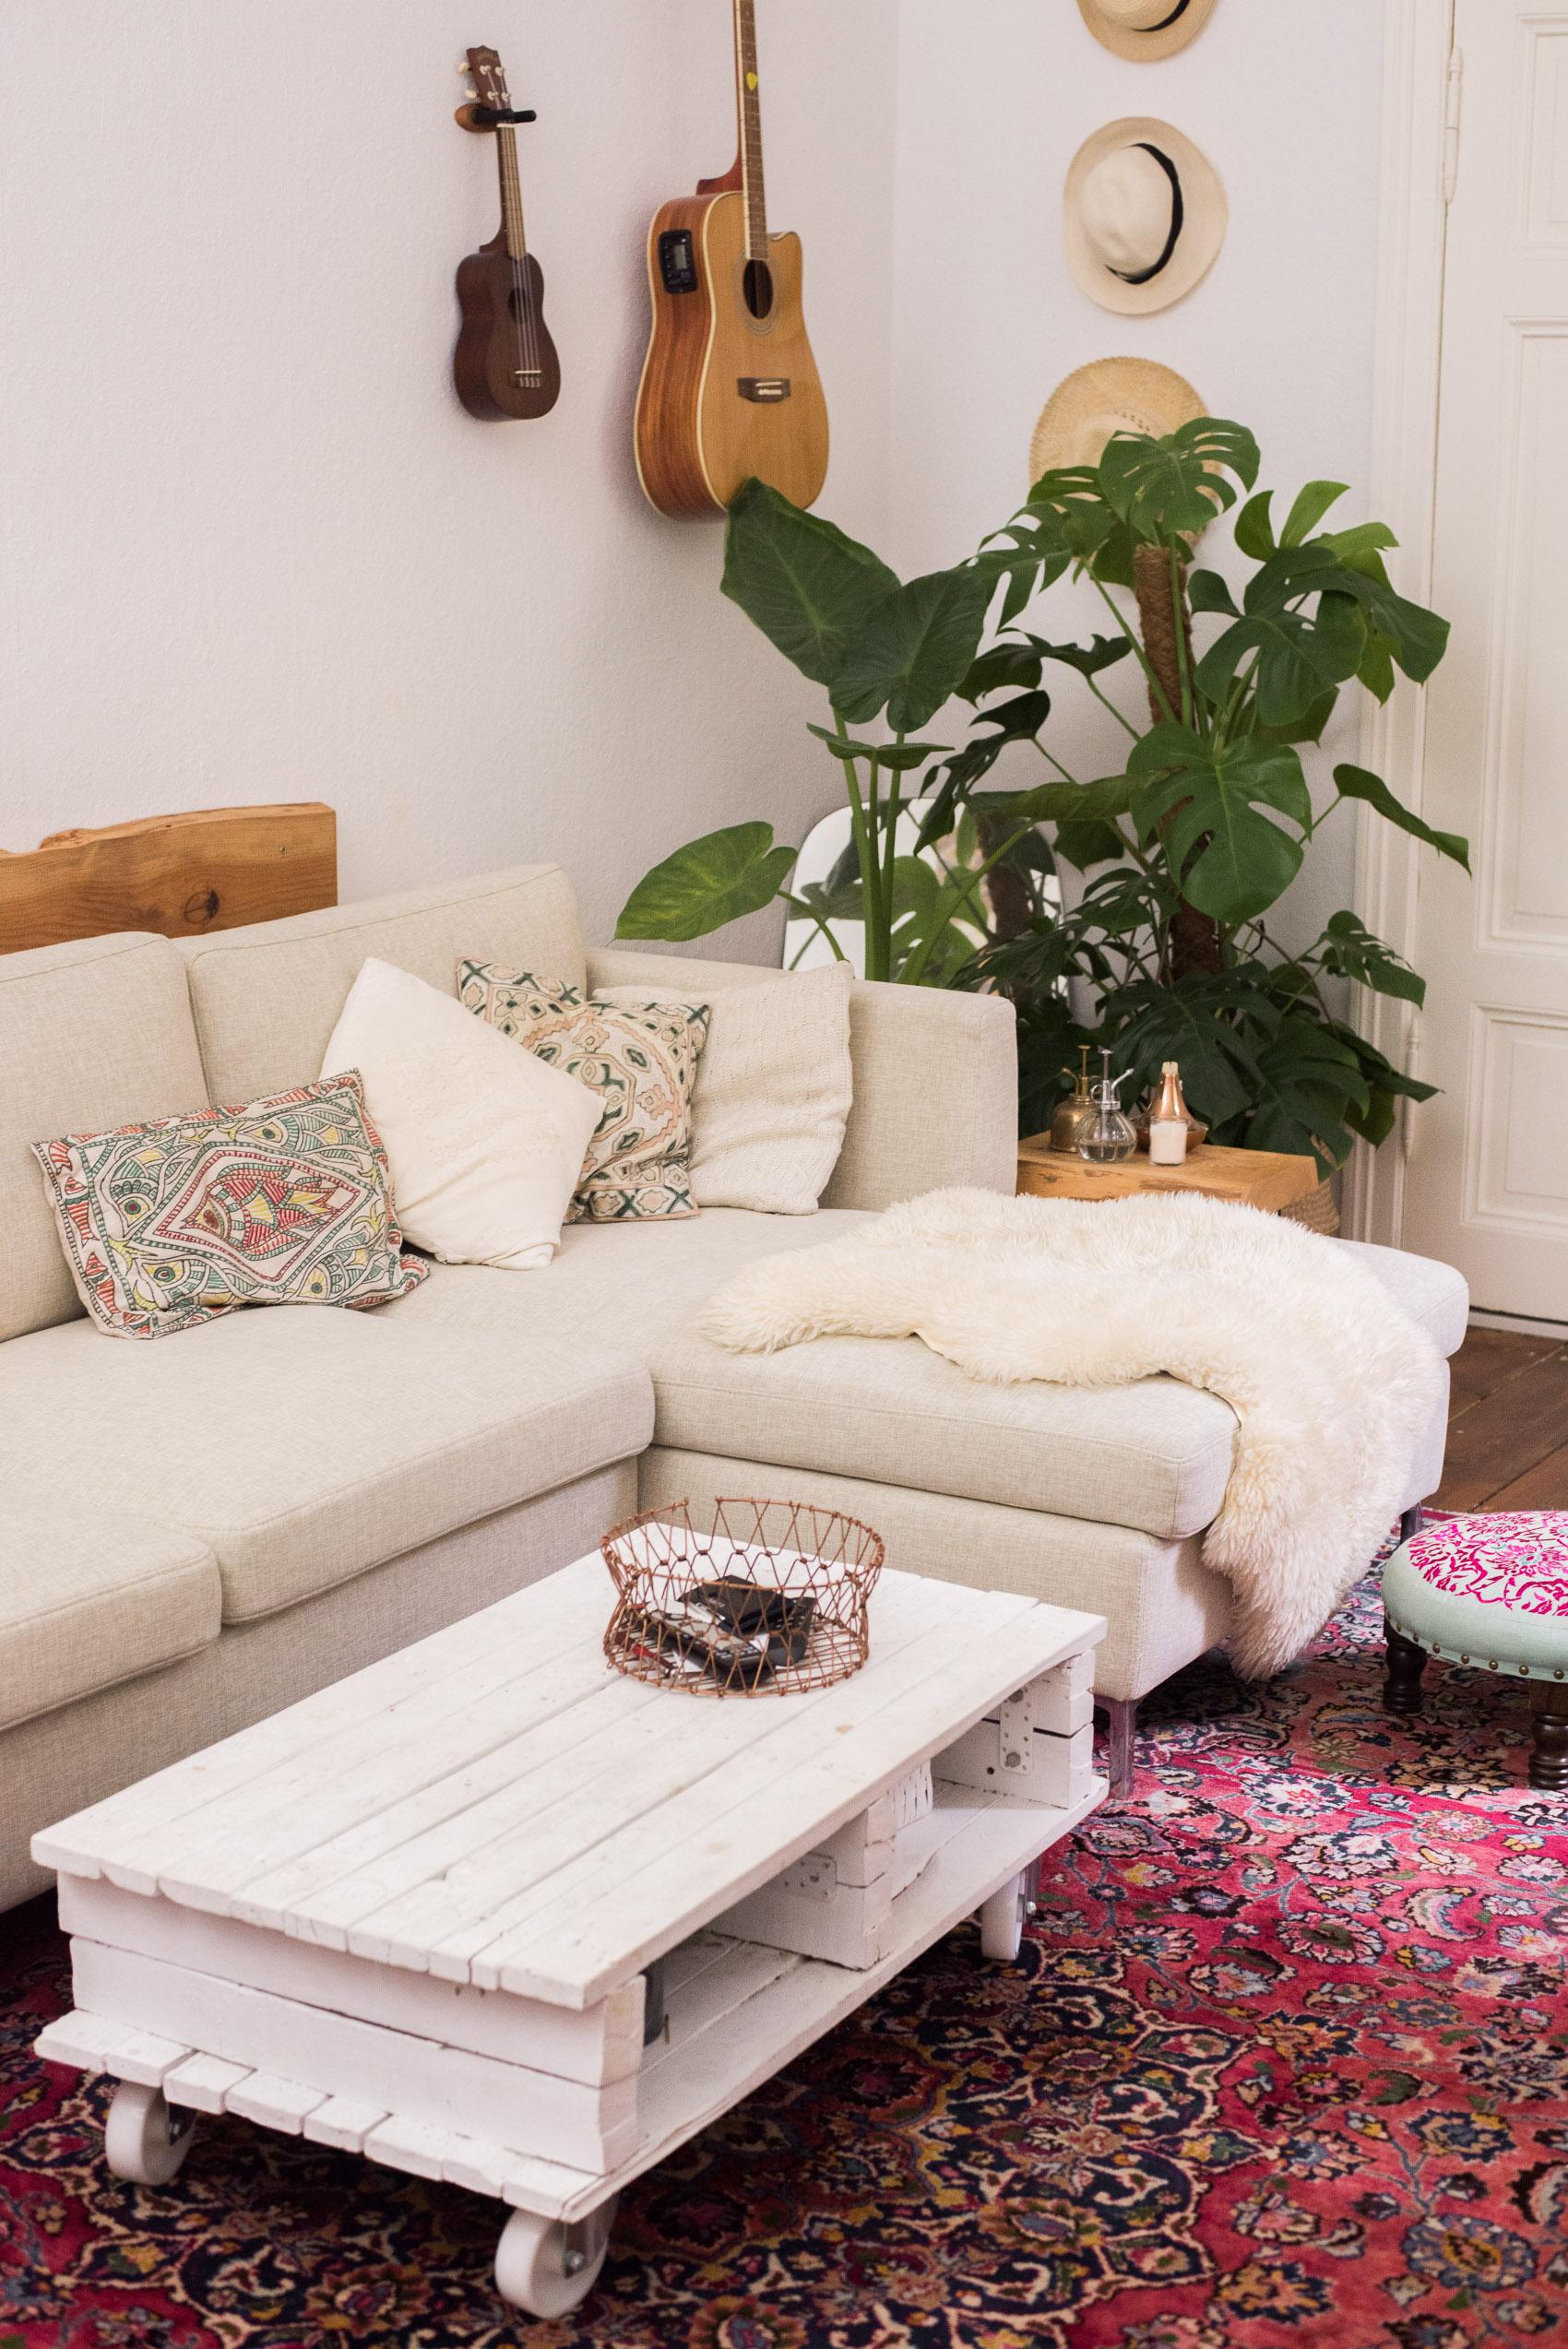 Boho Living Room Update: Our perfect sofa! - heylilahey.